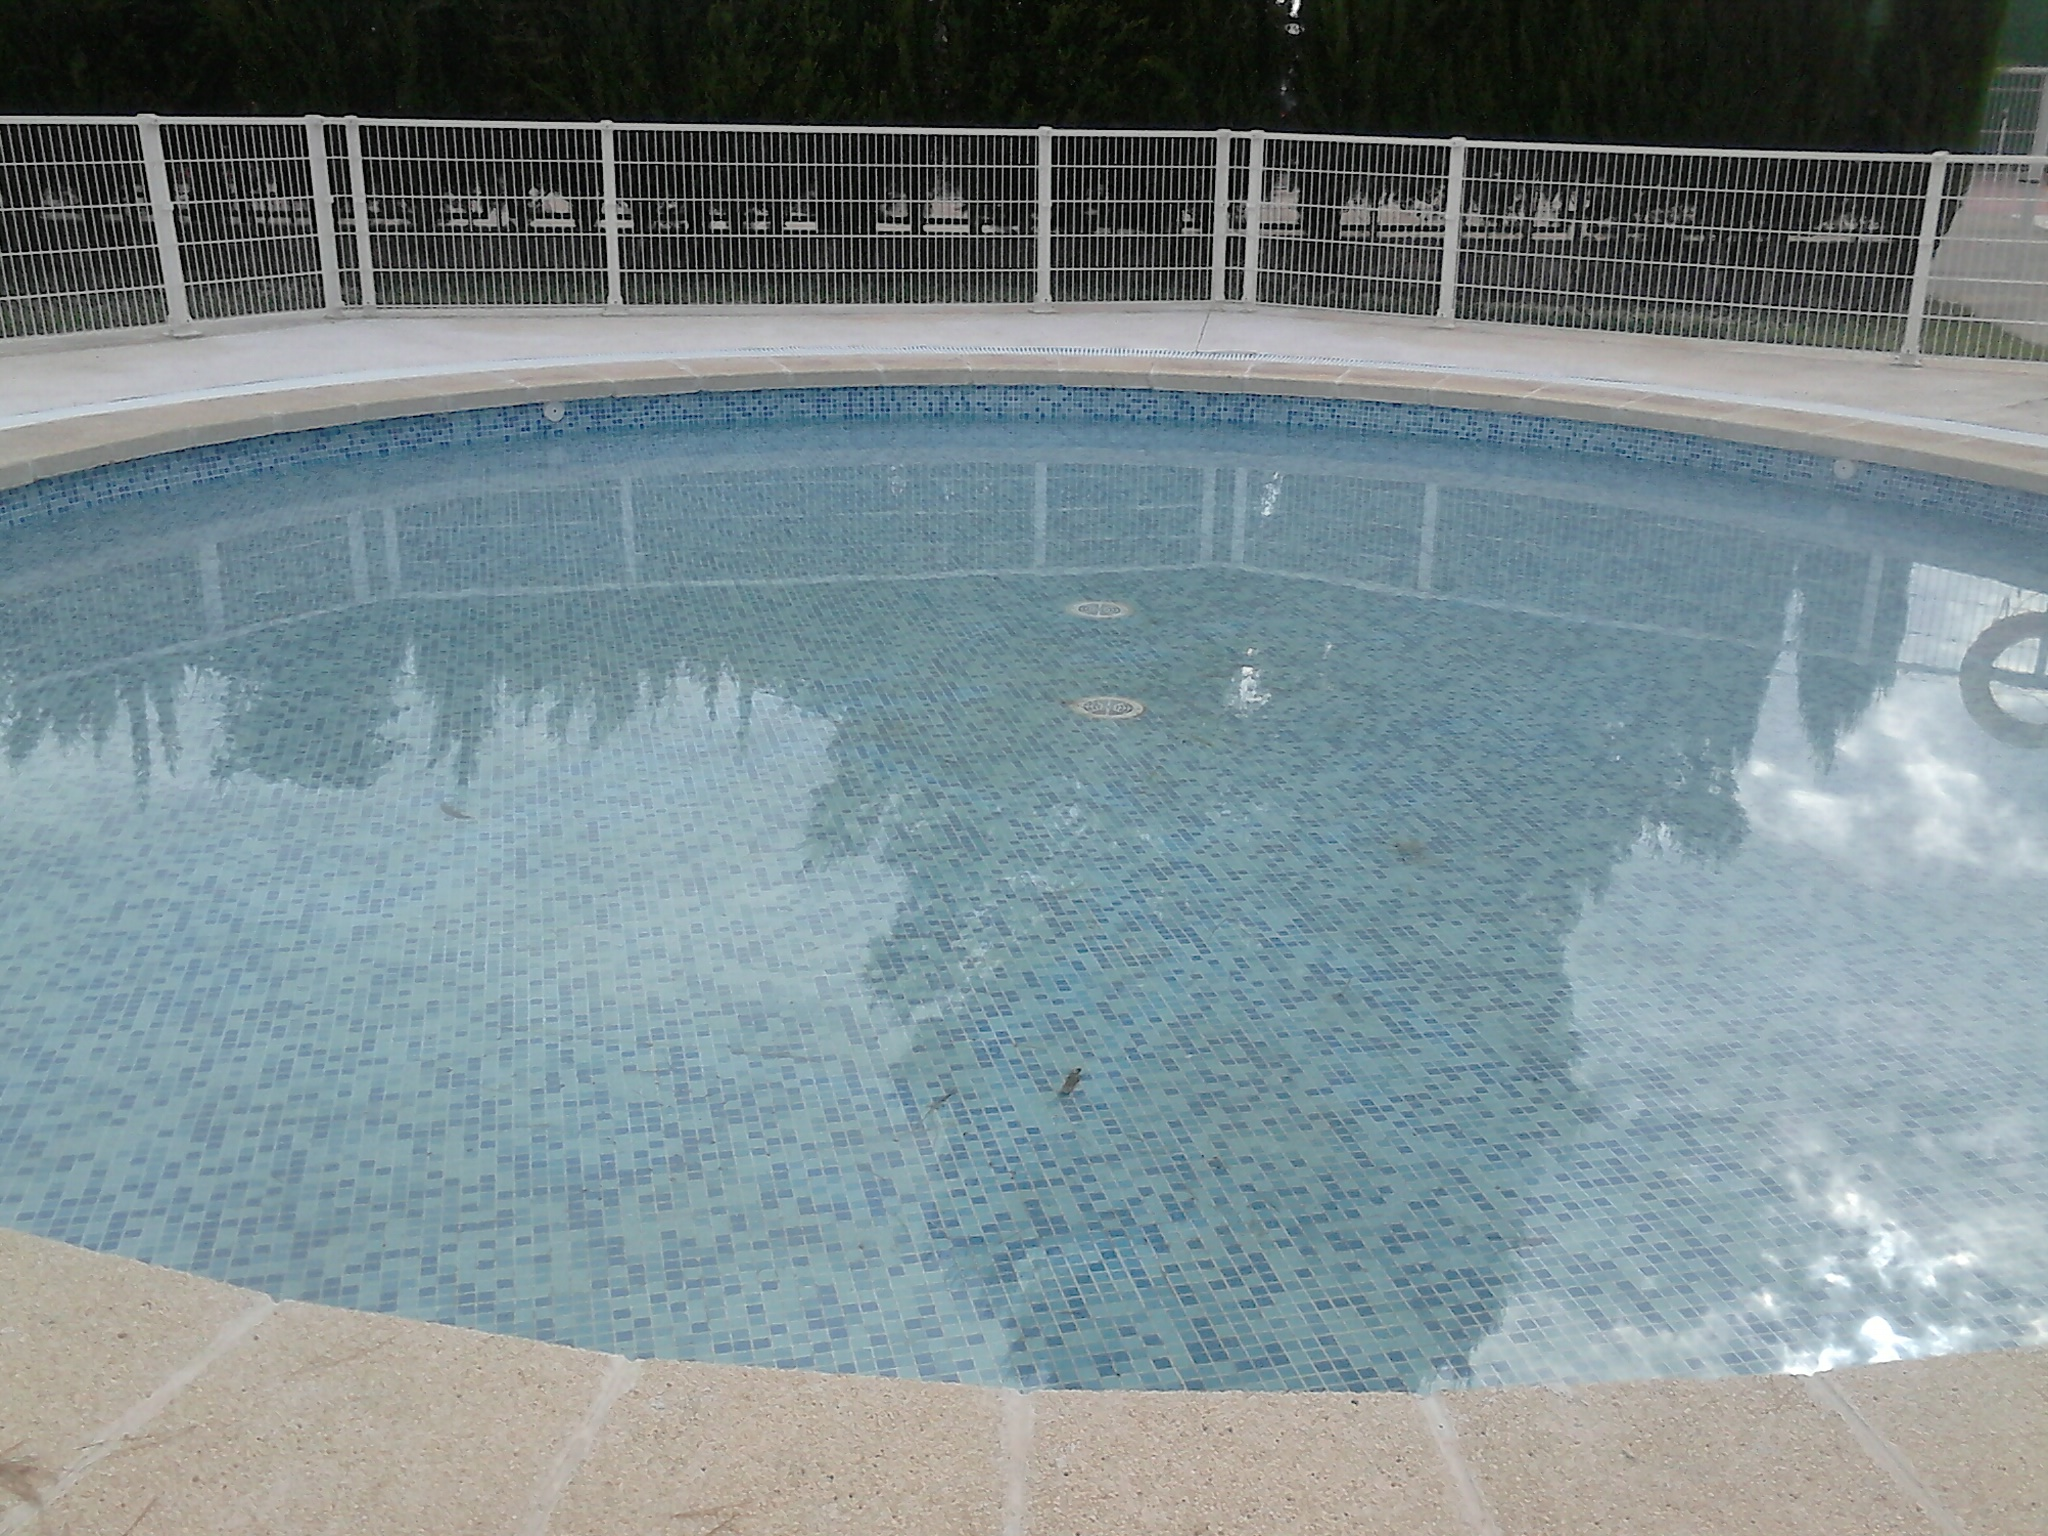 Piscinas de acero galvanizado piscinas de acero for Piscinas de acero galvanizado